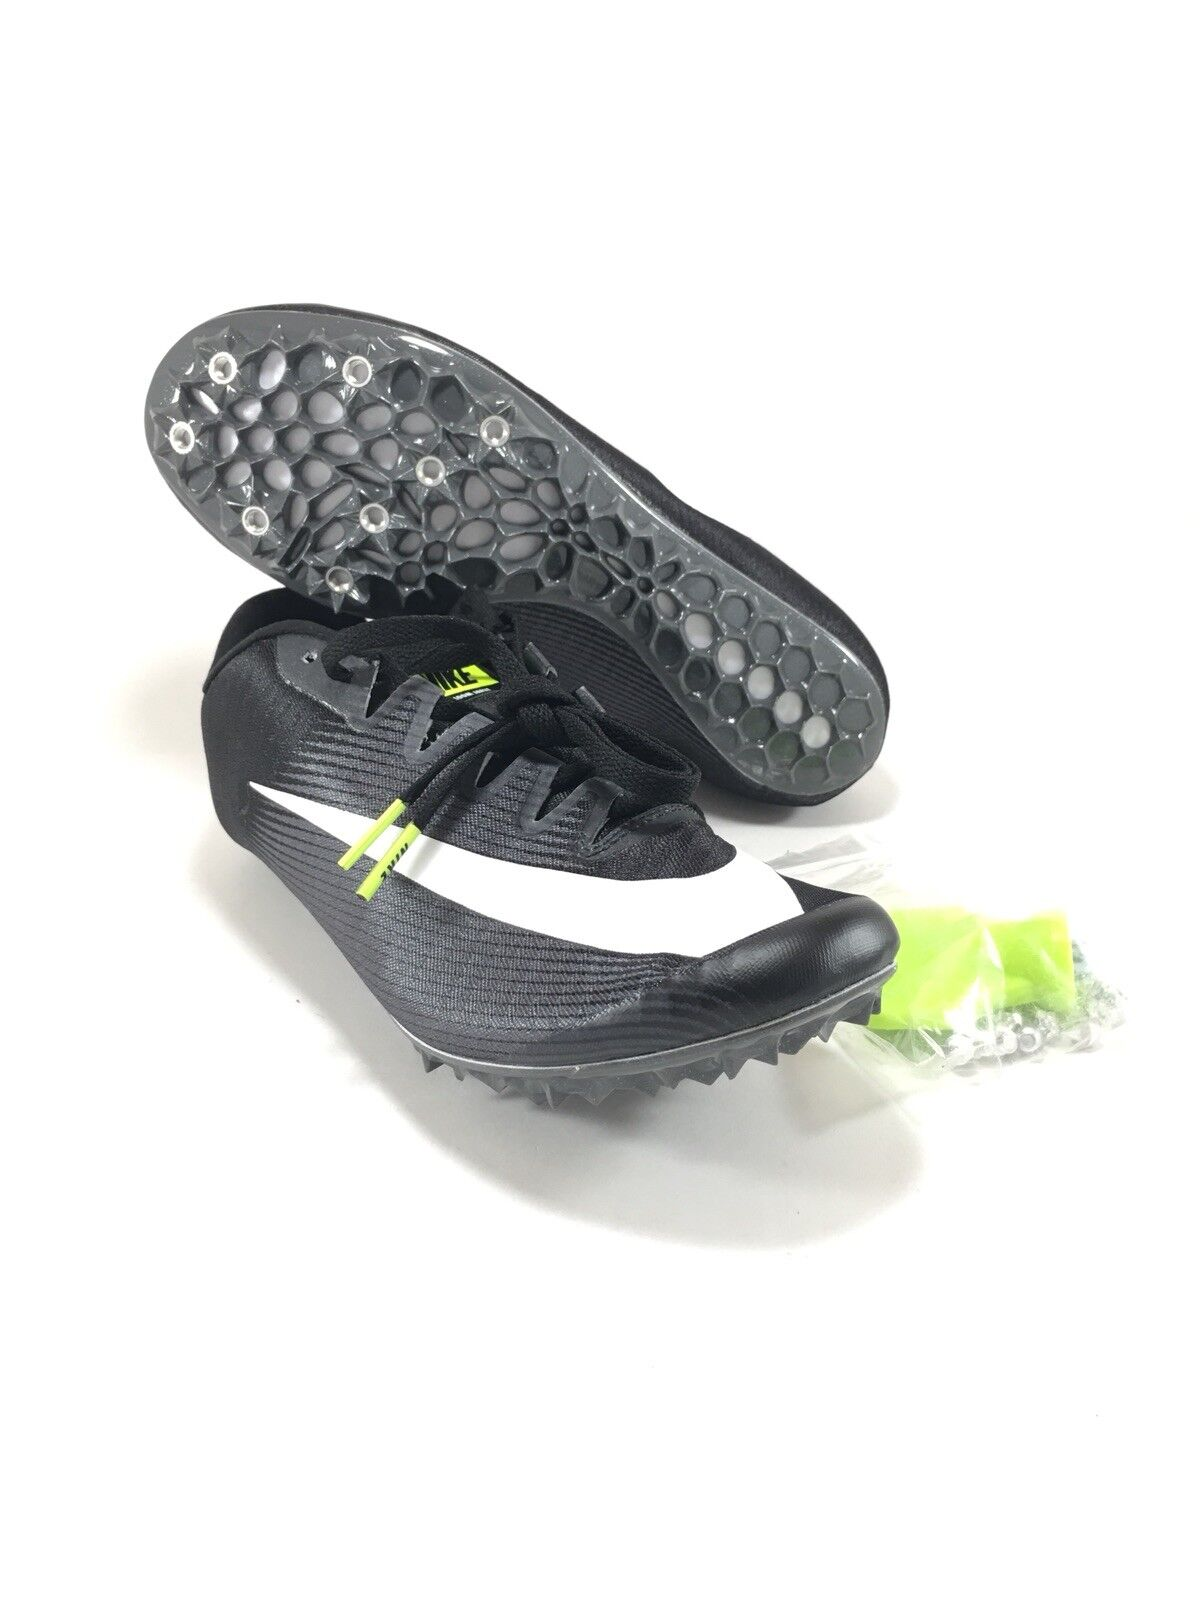 Nike Zoom JA Fly 3 Track Spikes Black White Grey 865633 017 Mens Size 12.5 New